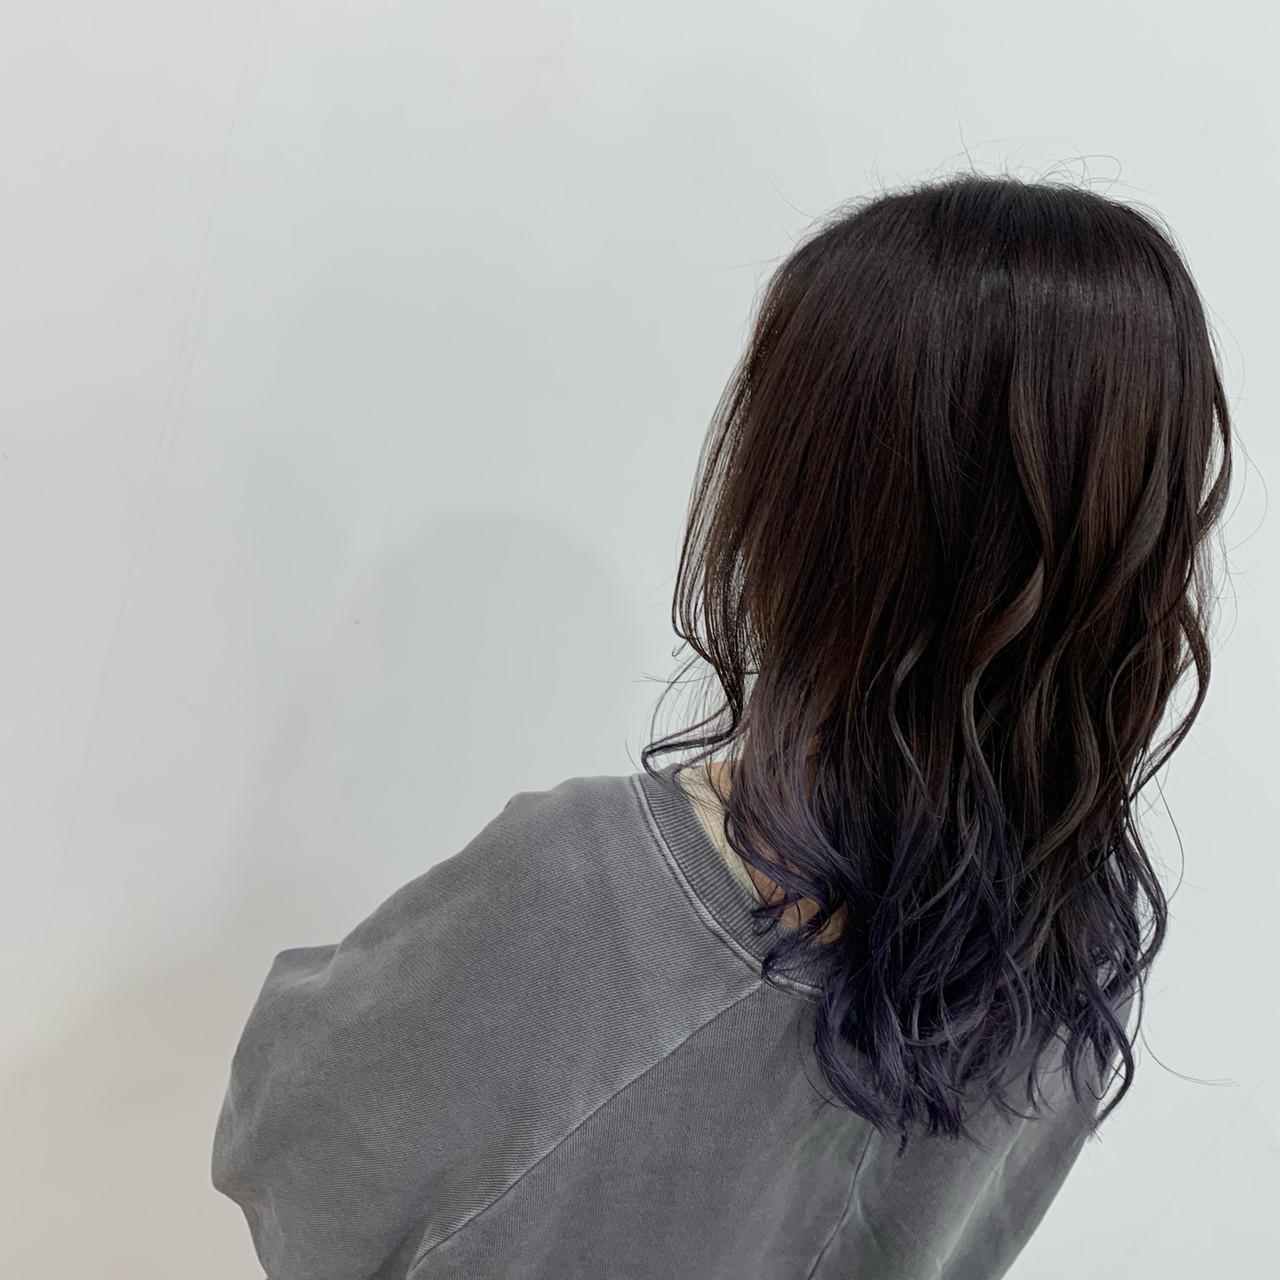 N.オイル ブルーラベンダー グラデーションカラー ブリーチ ヘアスタイルや髪型の写真・画像